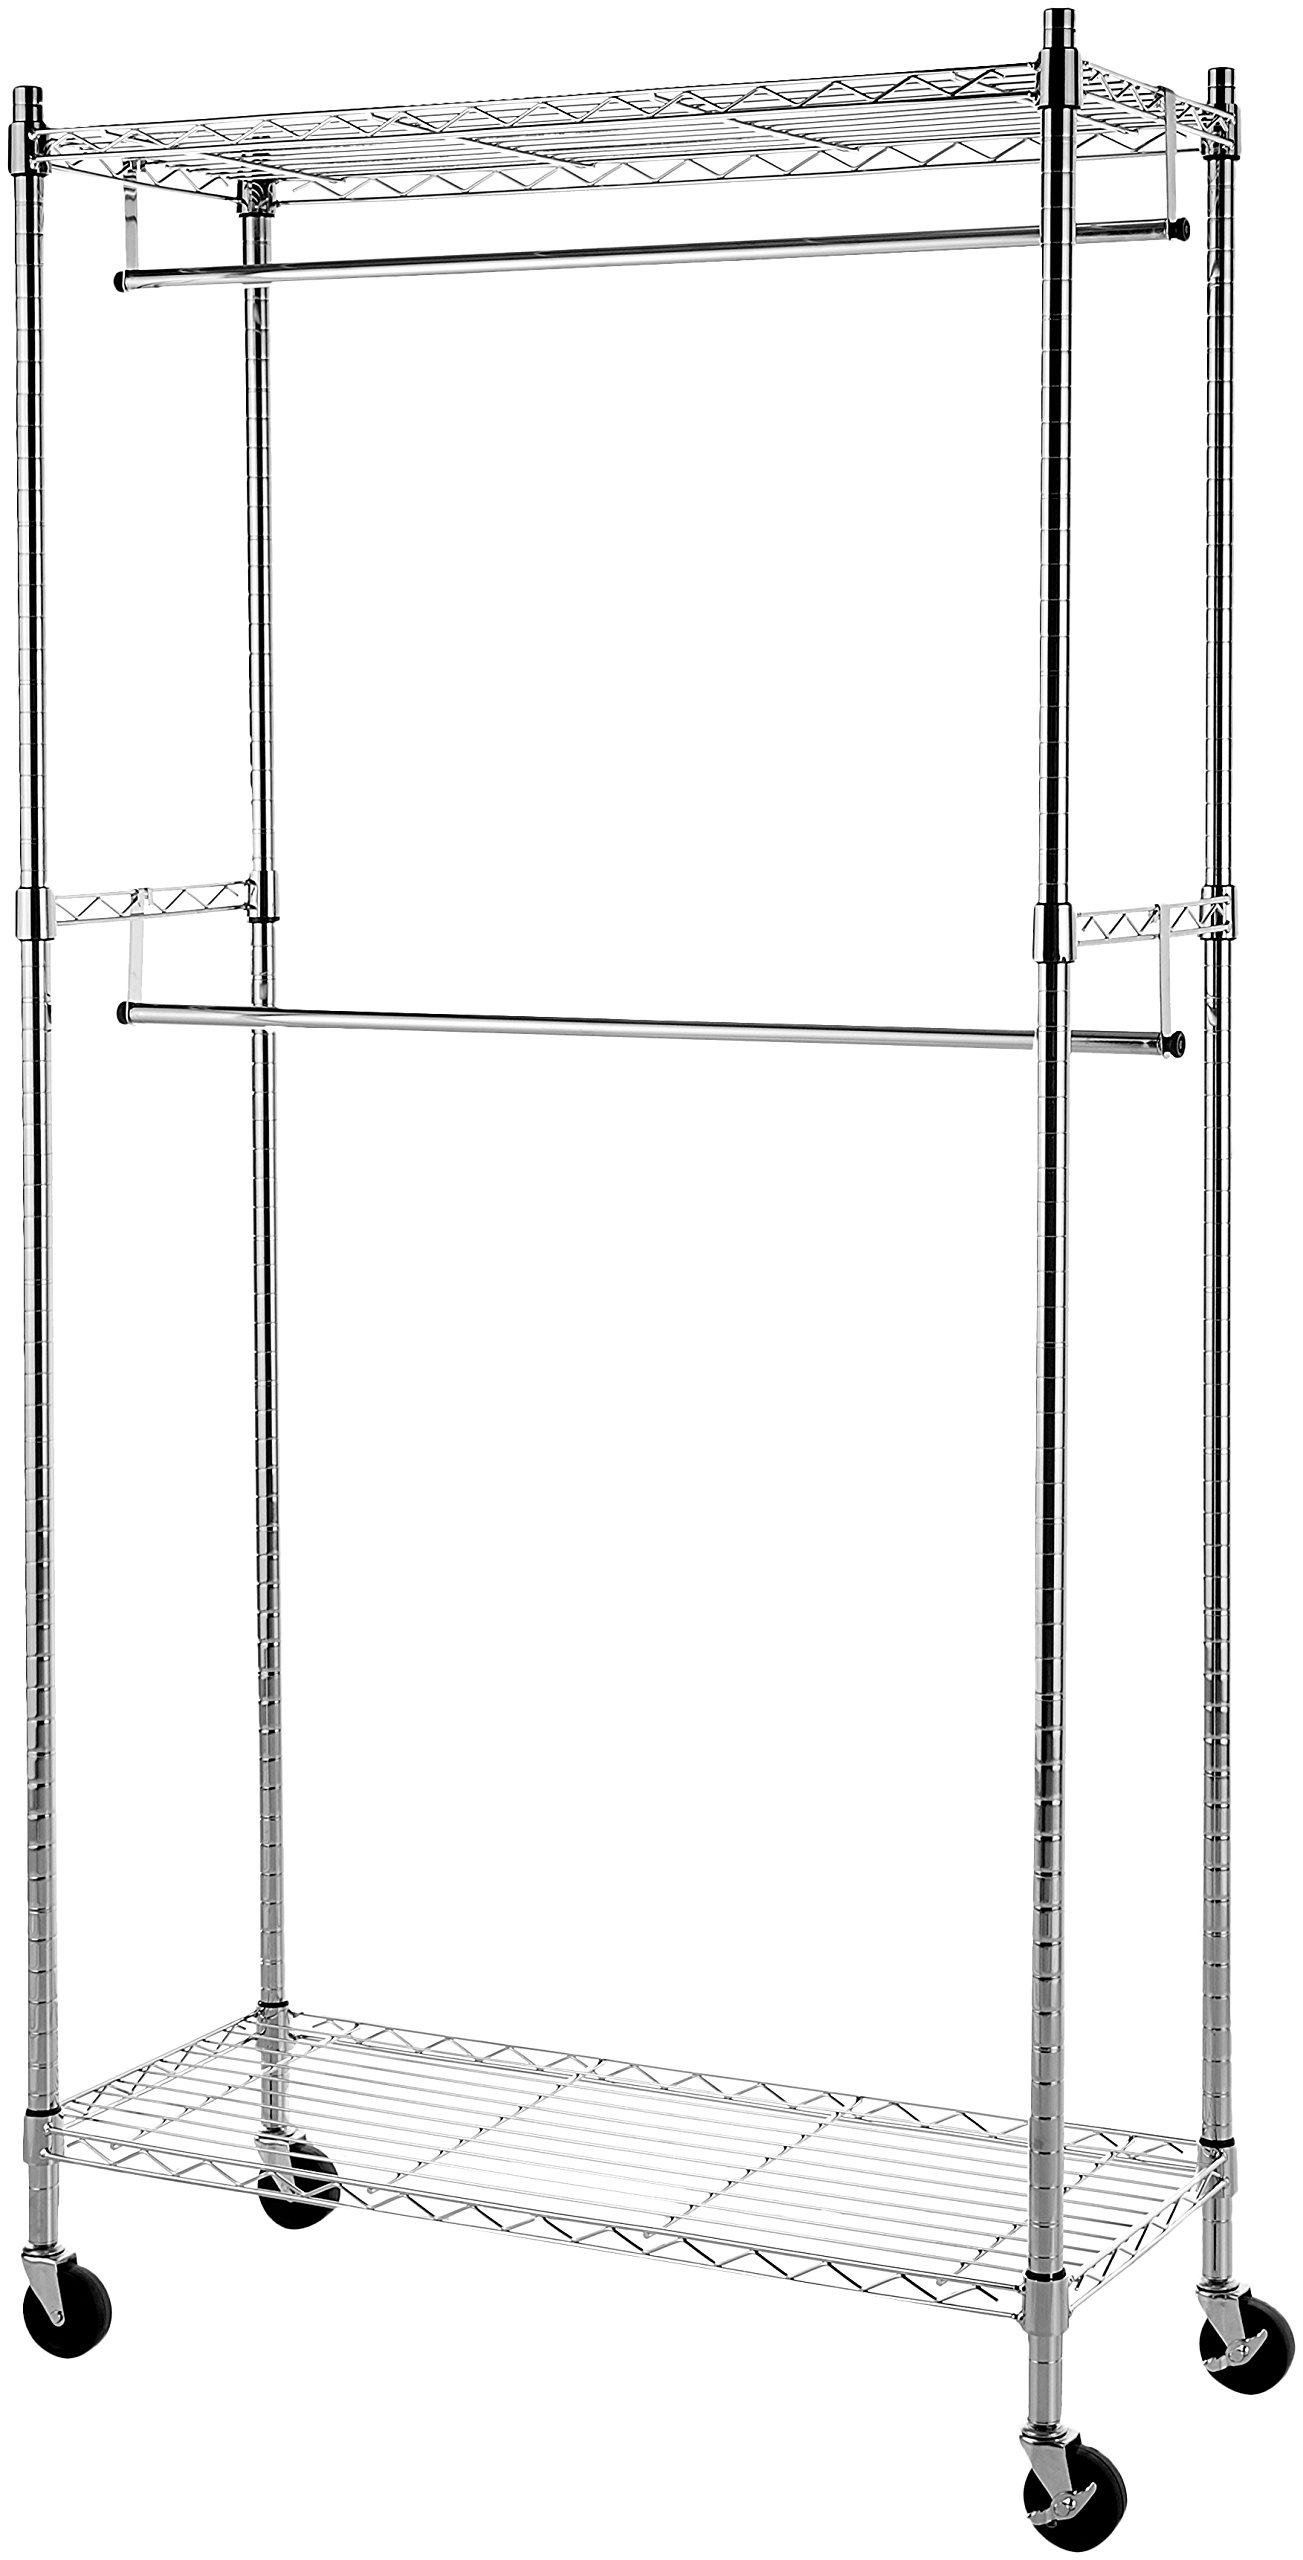 Amazon Basics Double Hanging Rod Garment Rolling Closet Organizer Rack, Chrome - 72 Inch Height